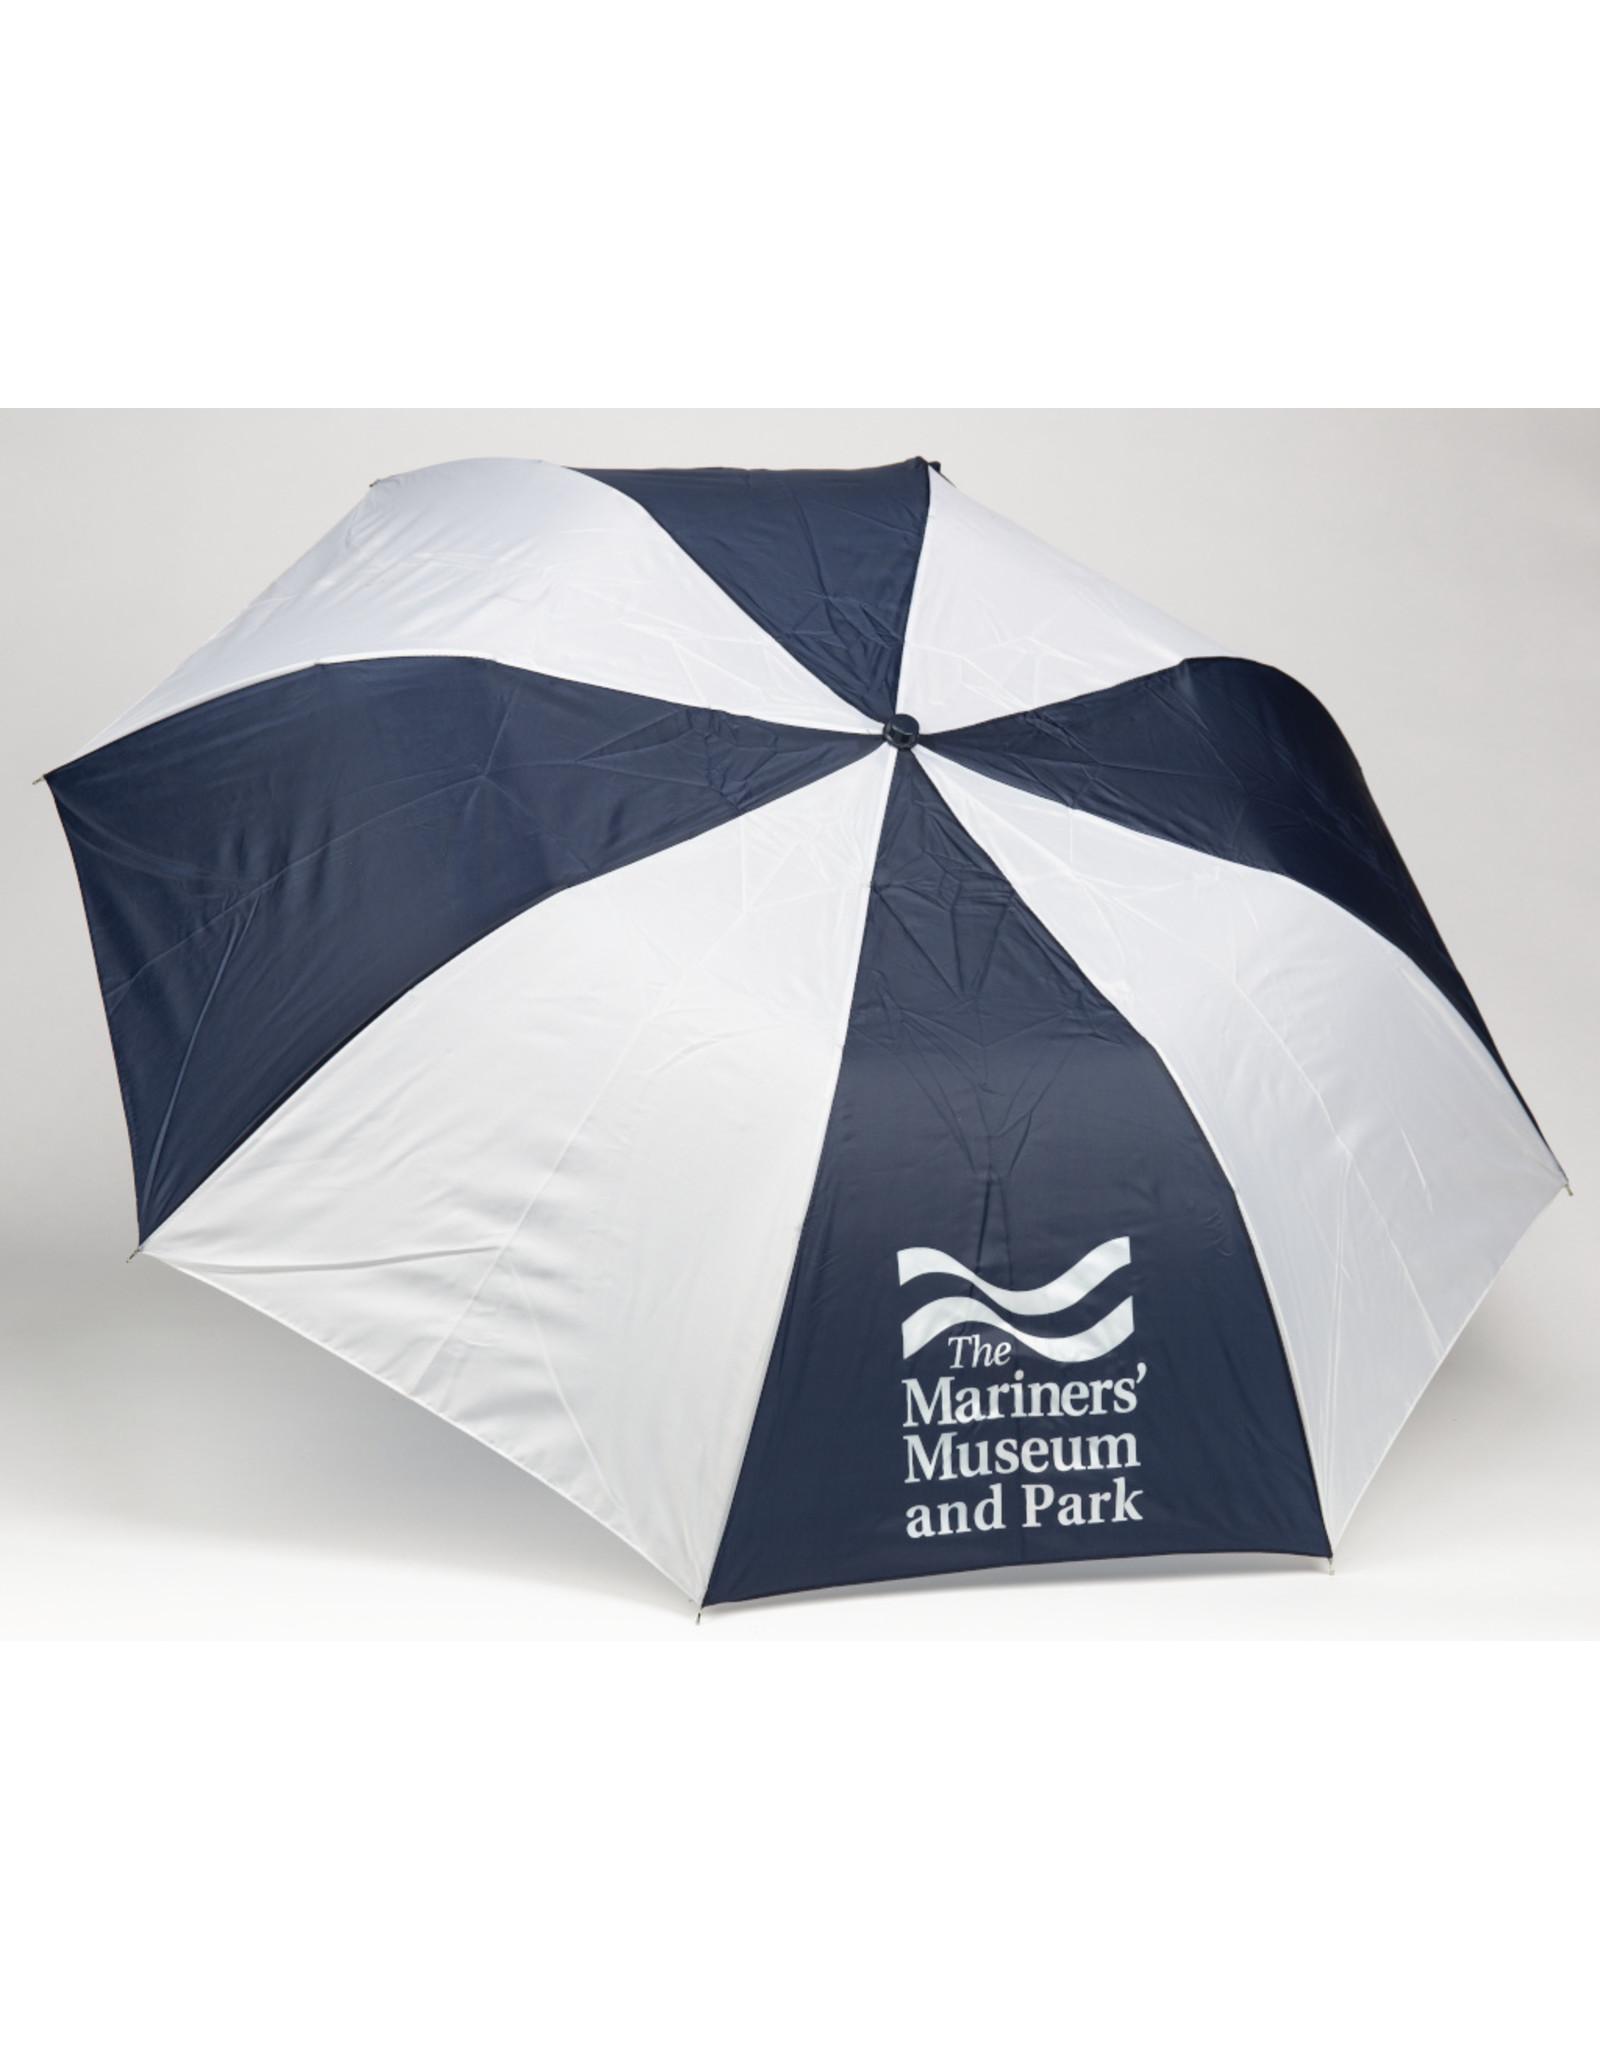 The Mariners' Museum and Park Logo Umbrella